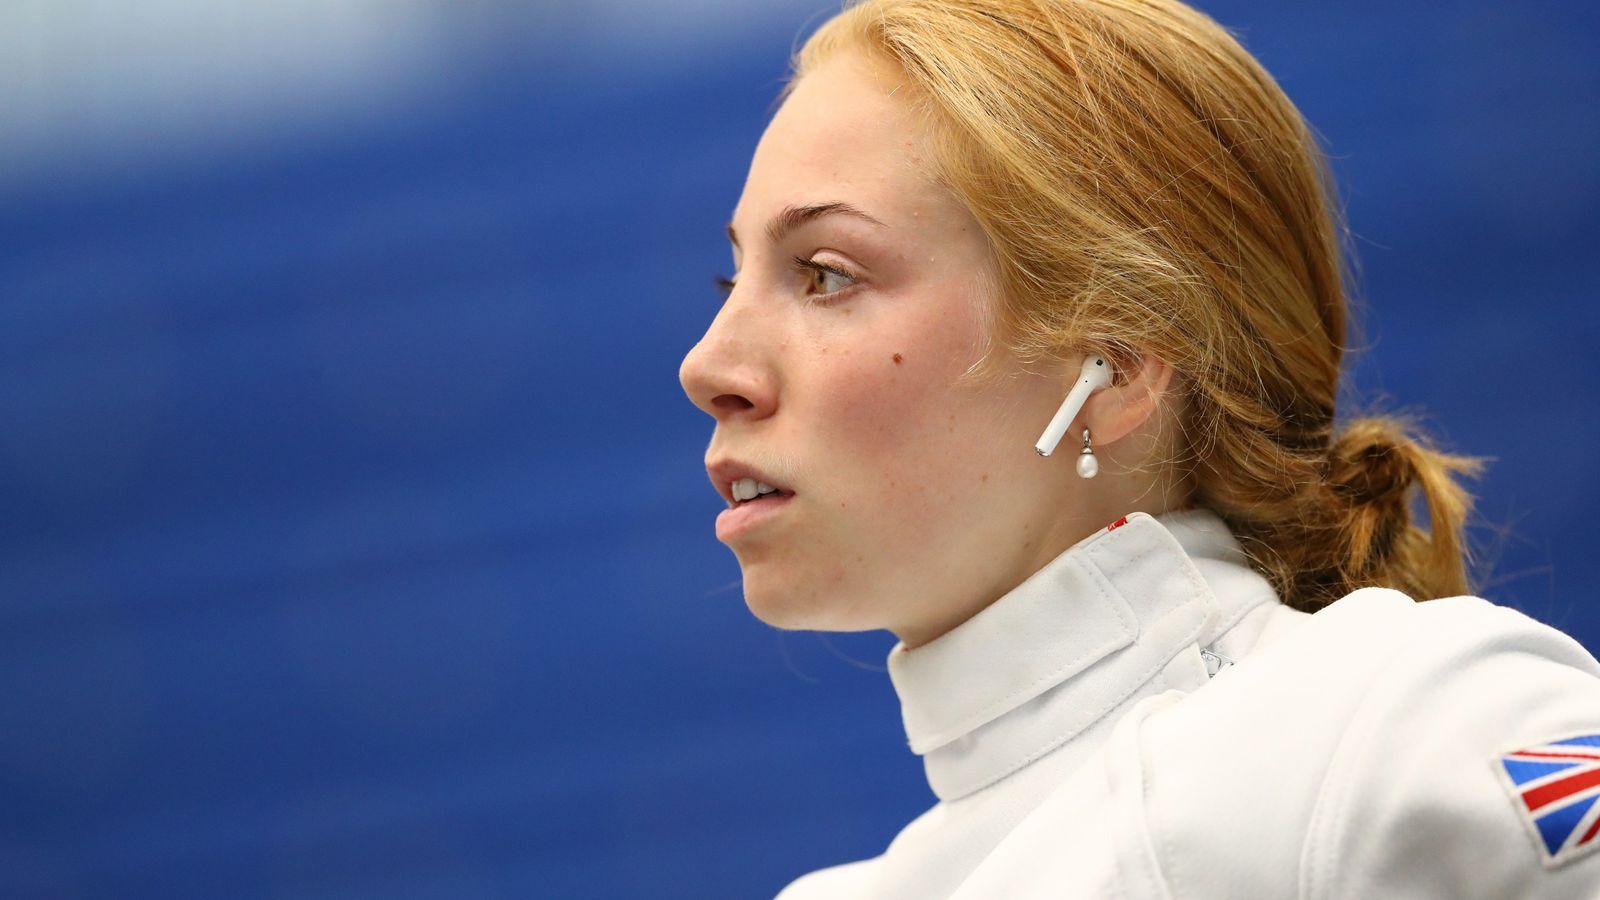 Modern Pentathlon World Cup: Francesca Summers secures silver after battle with Jo Muir